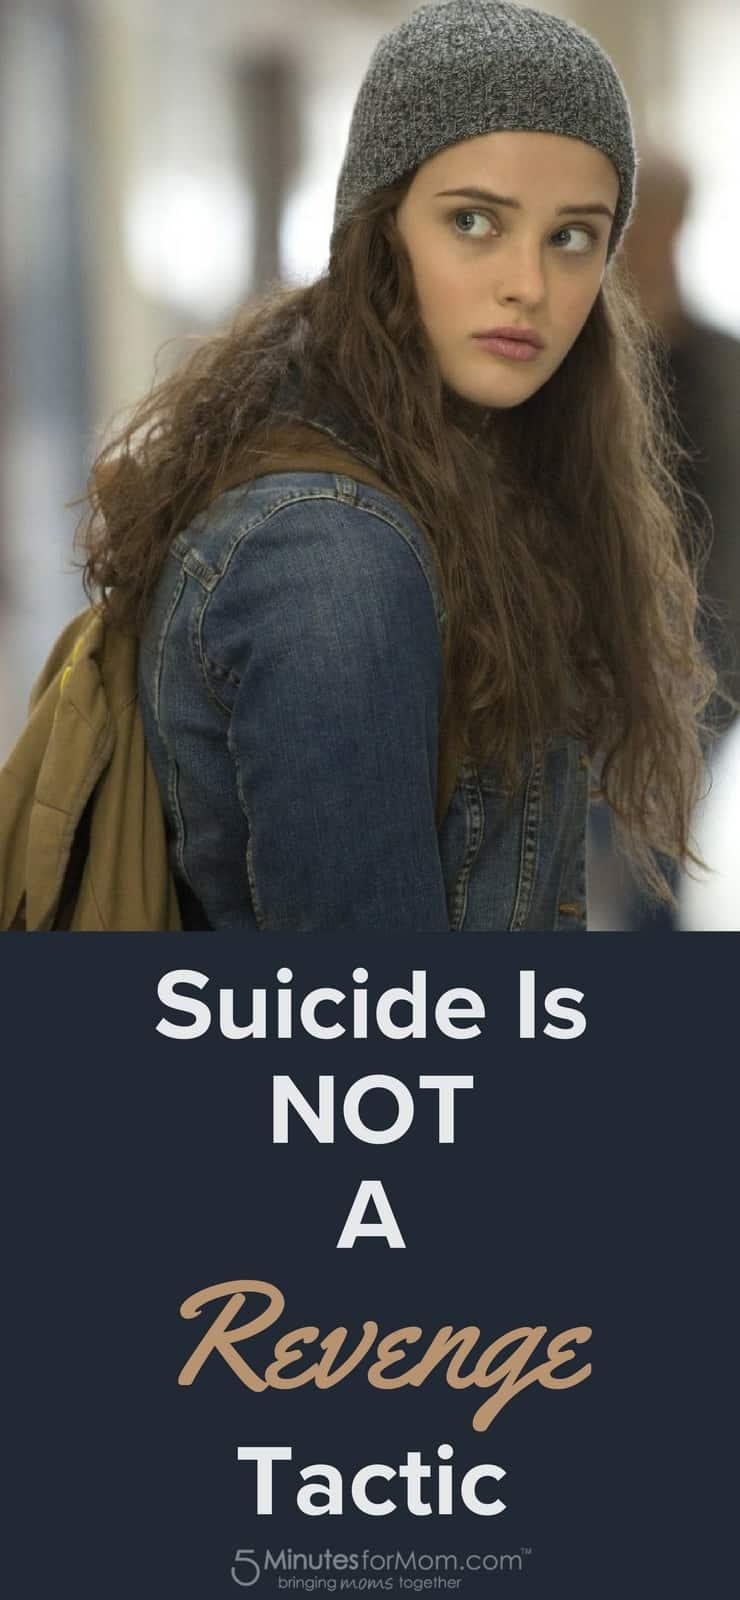 Suicide is not a revenge tactic